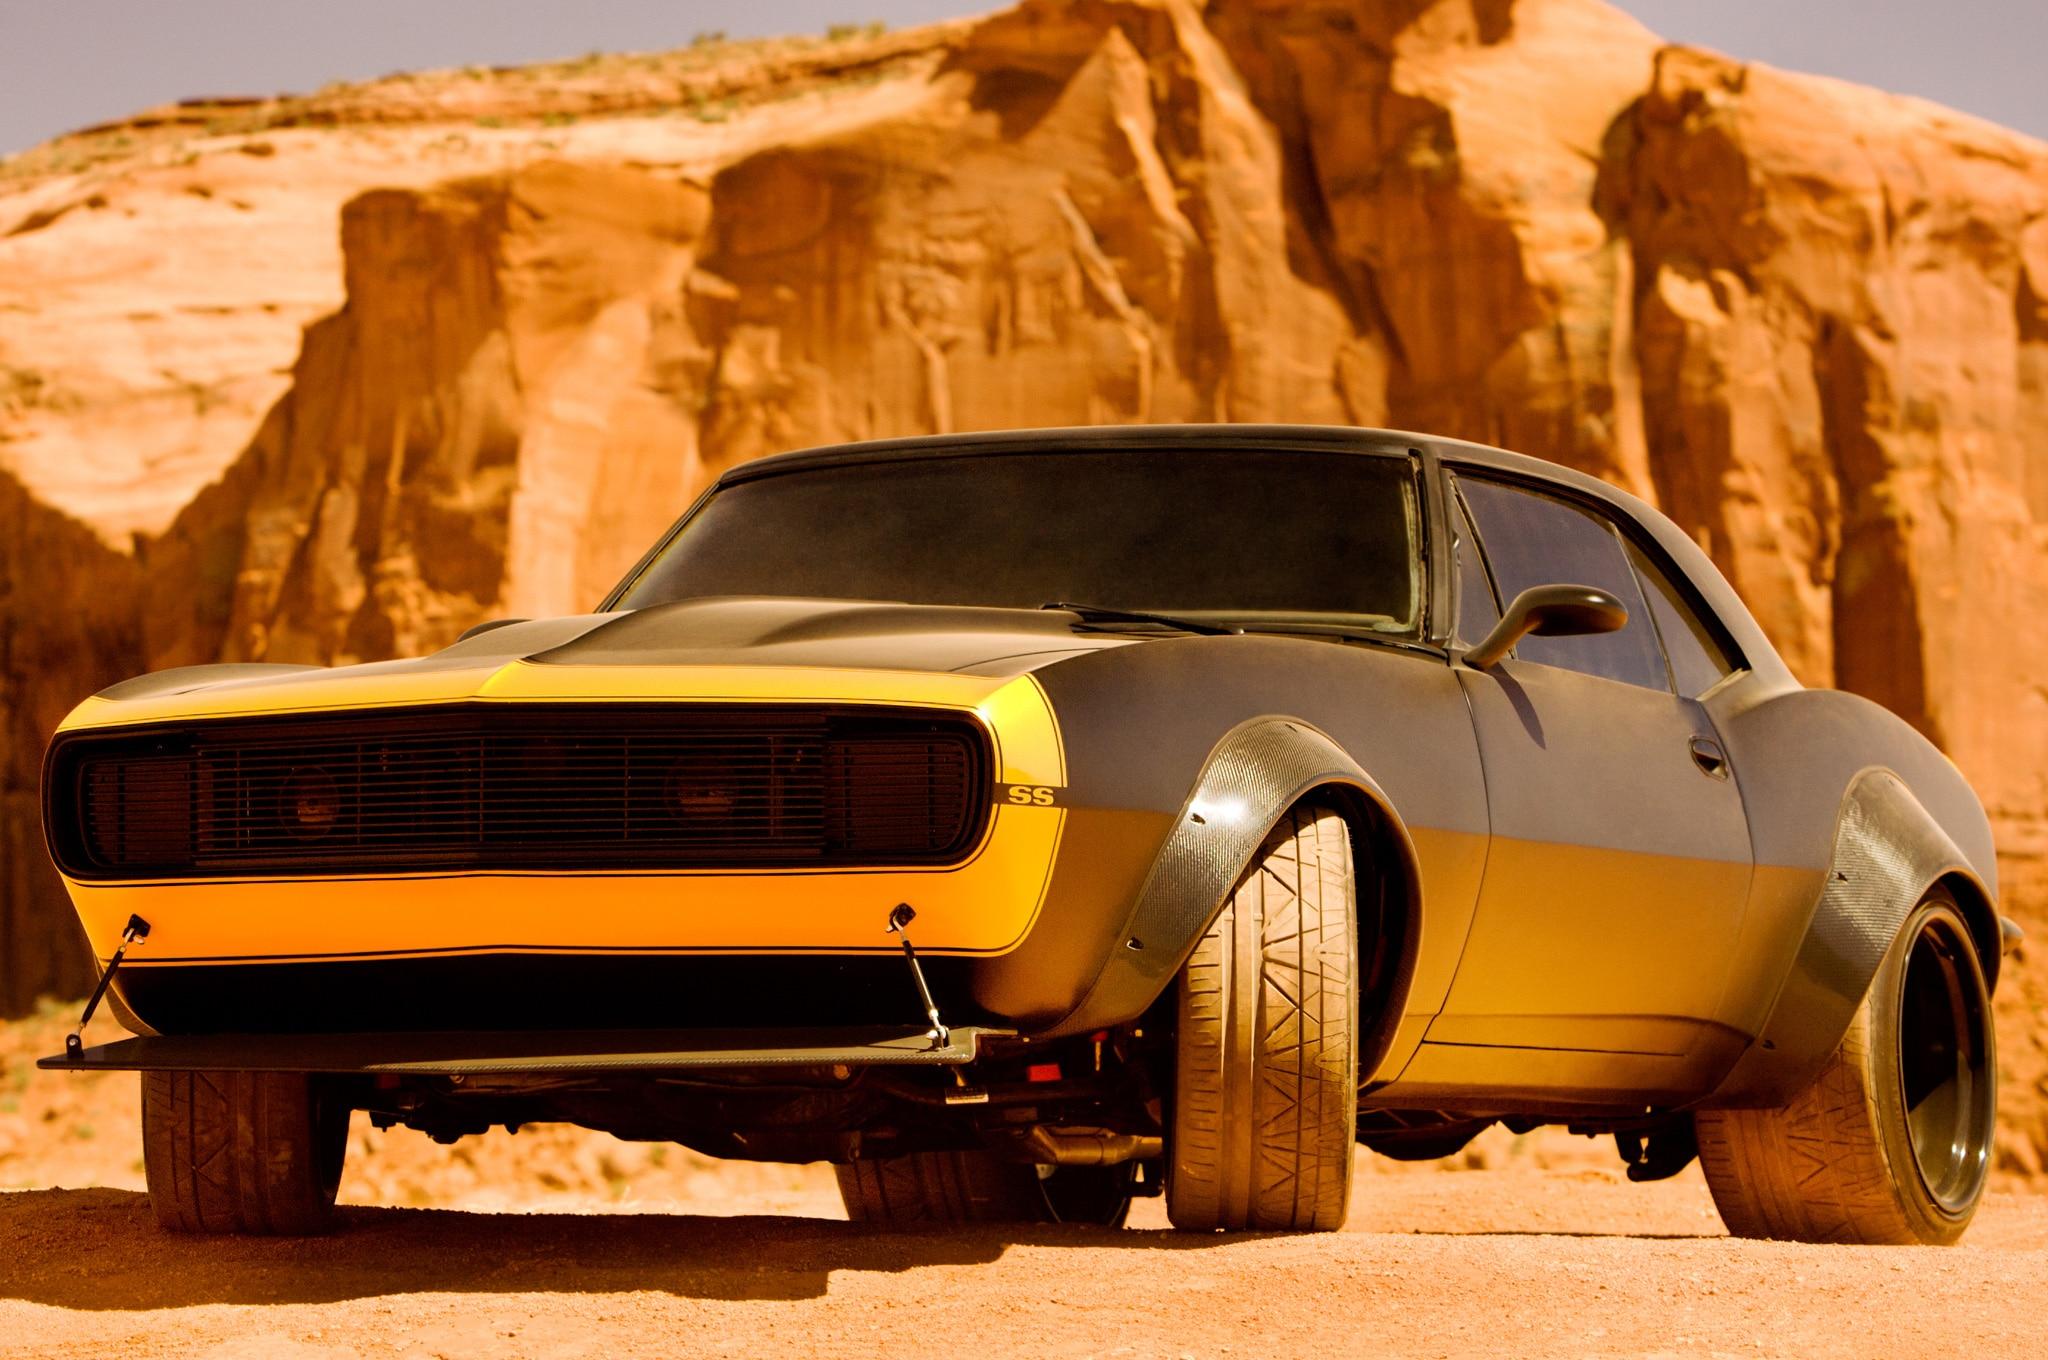 Kelebihan Kekurangan Camaro 1967 Murah Berkualitas